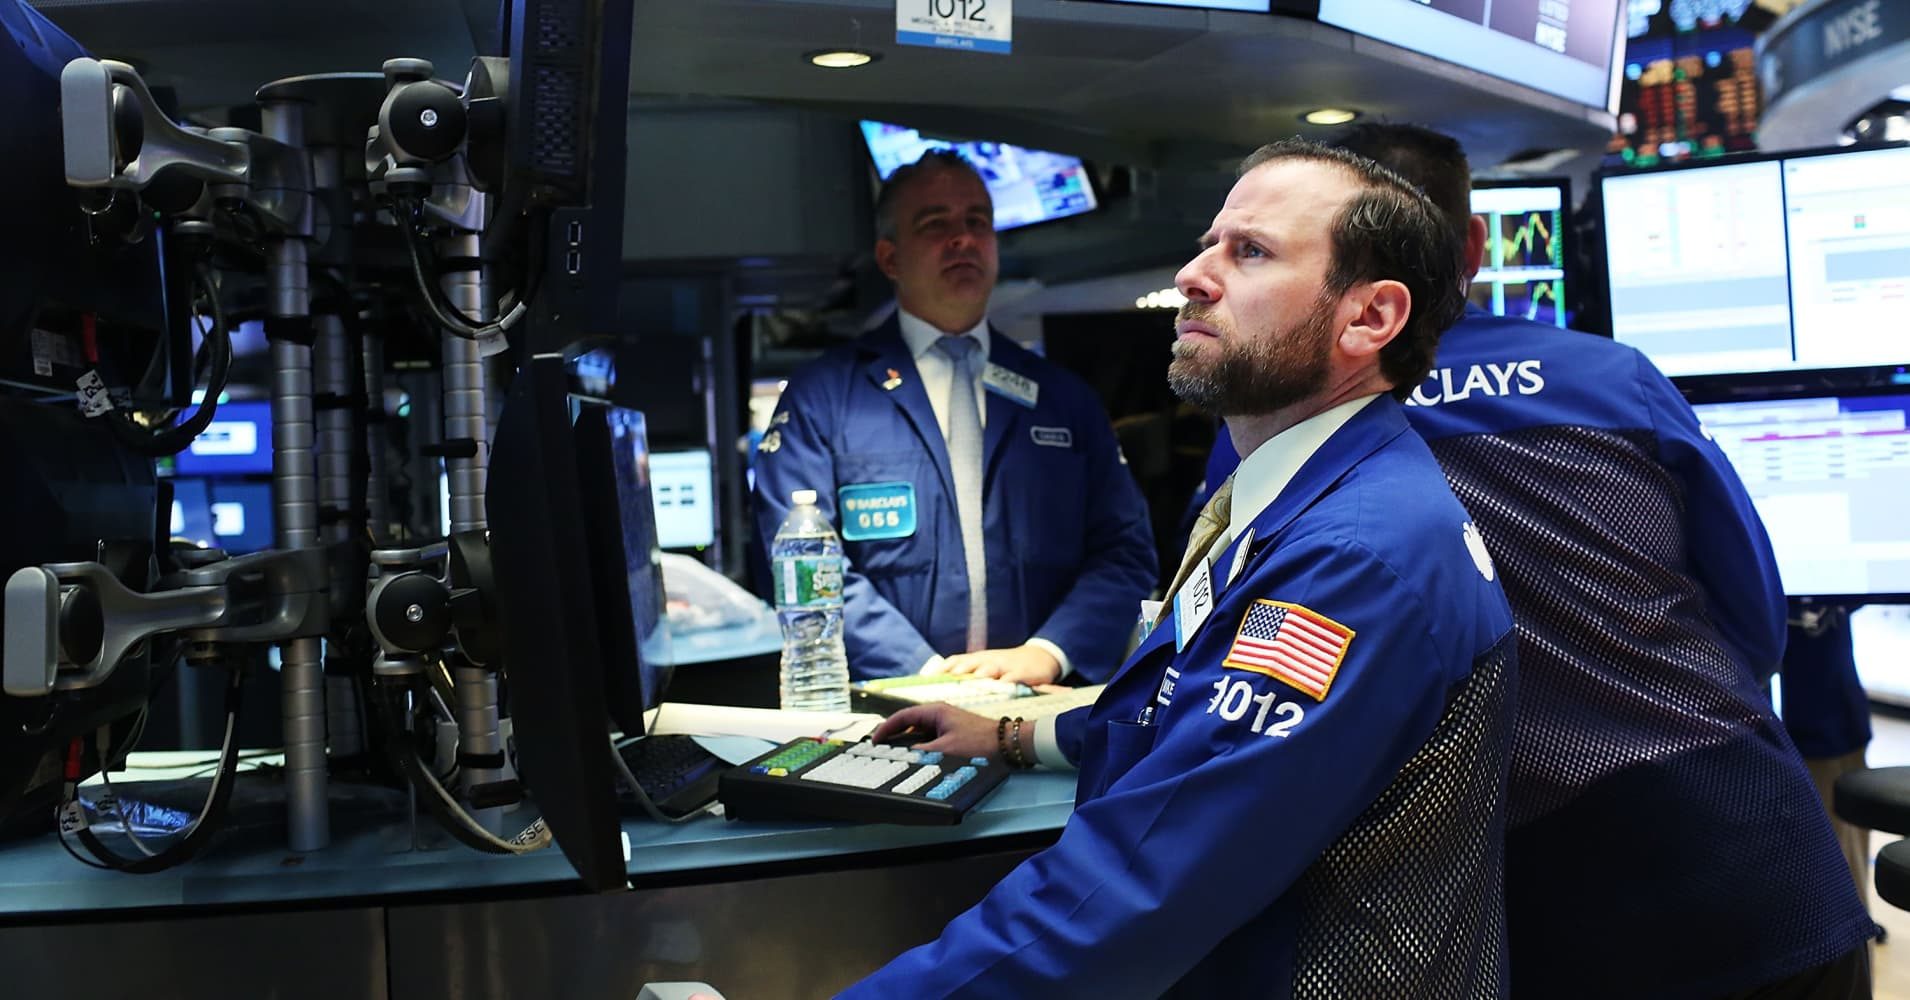 US Treasurys dip lower as bond investors await Fed speeches, data